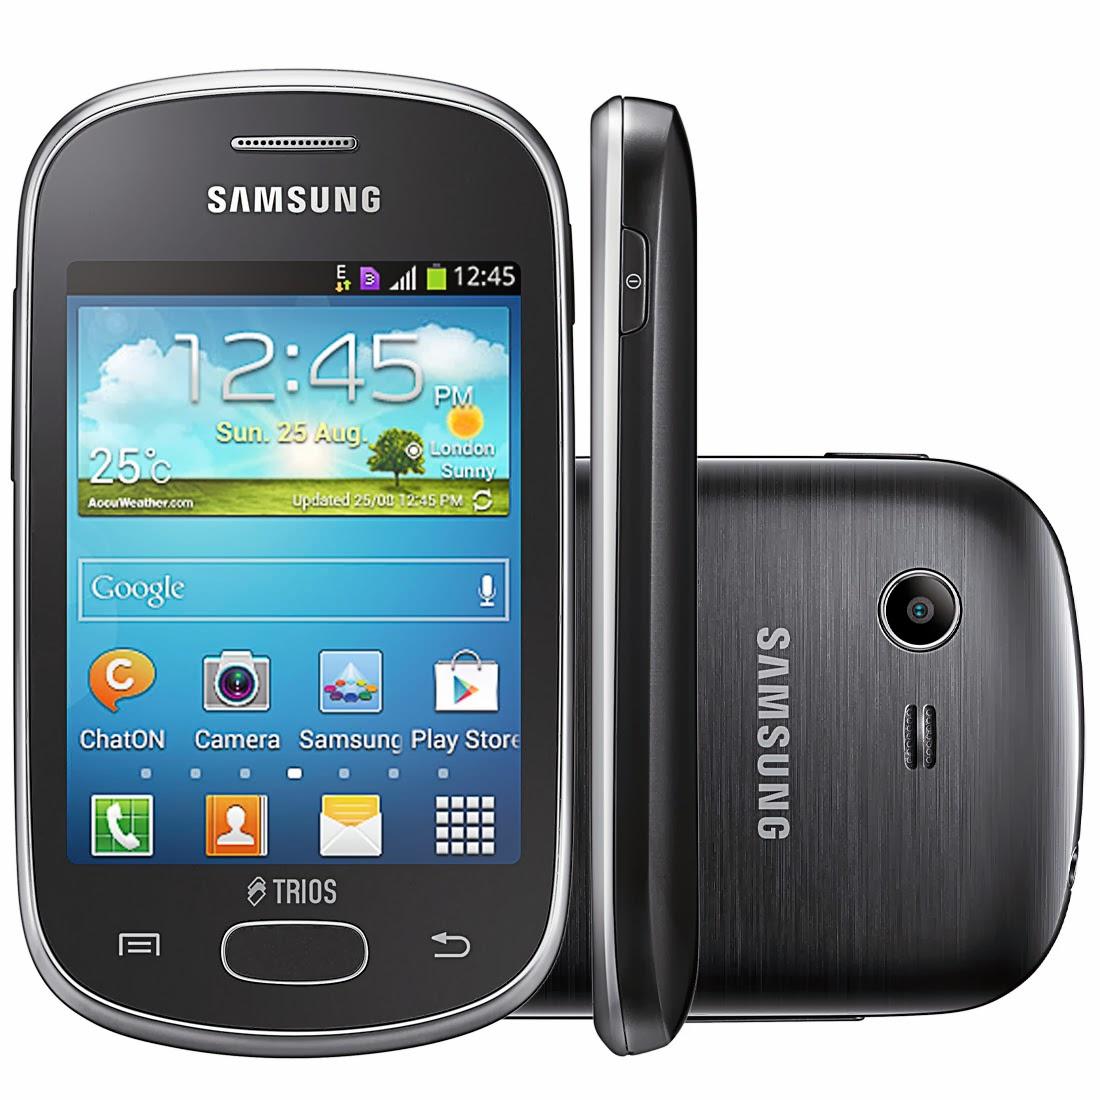 Harga Samsung Galaxy Star Trios S5283